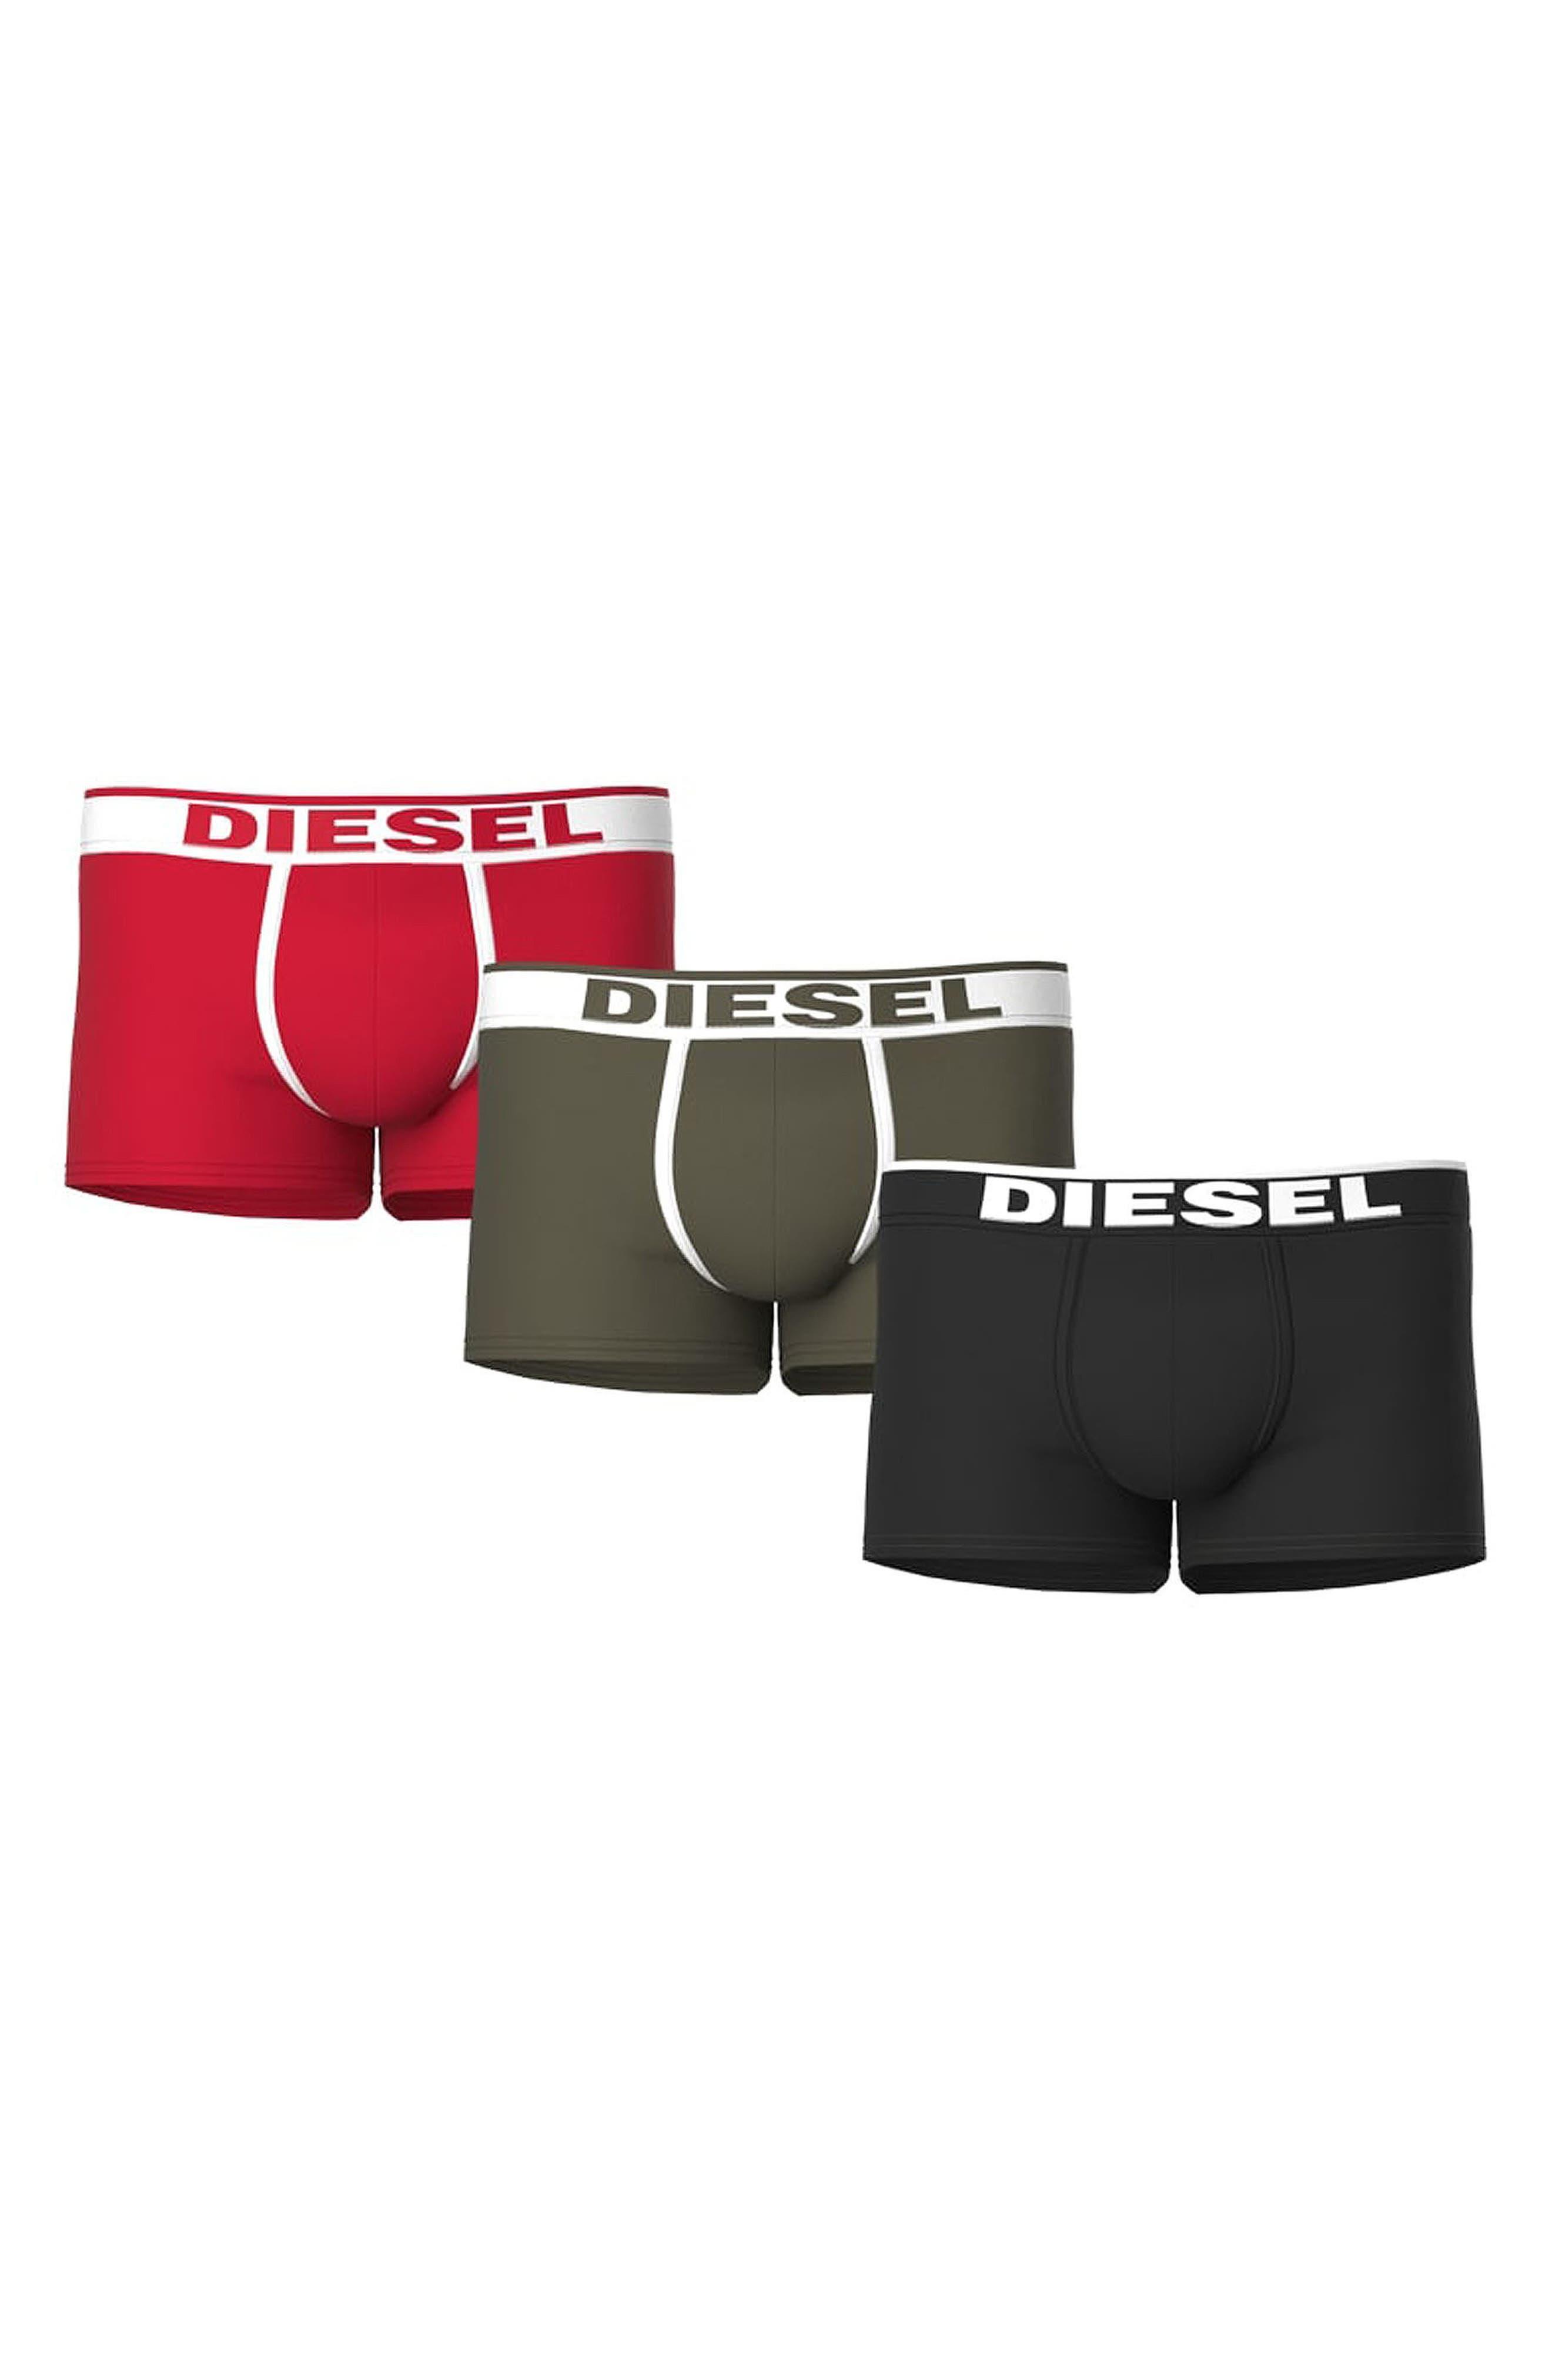 Men's Diesel Damien 3-Pack Cotton Trunks